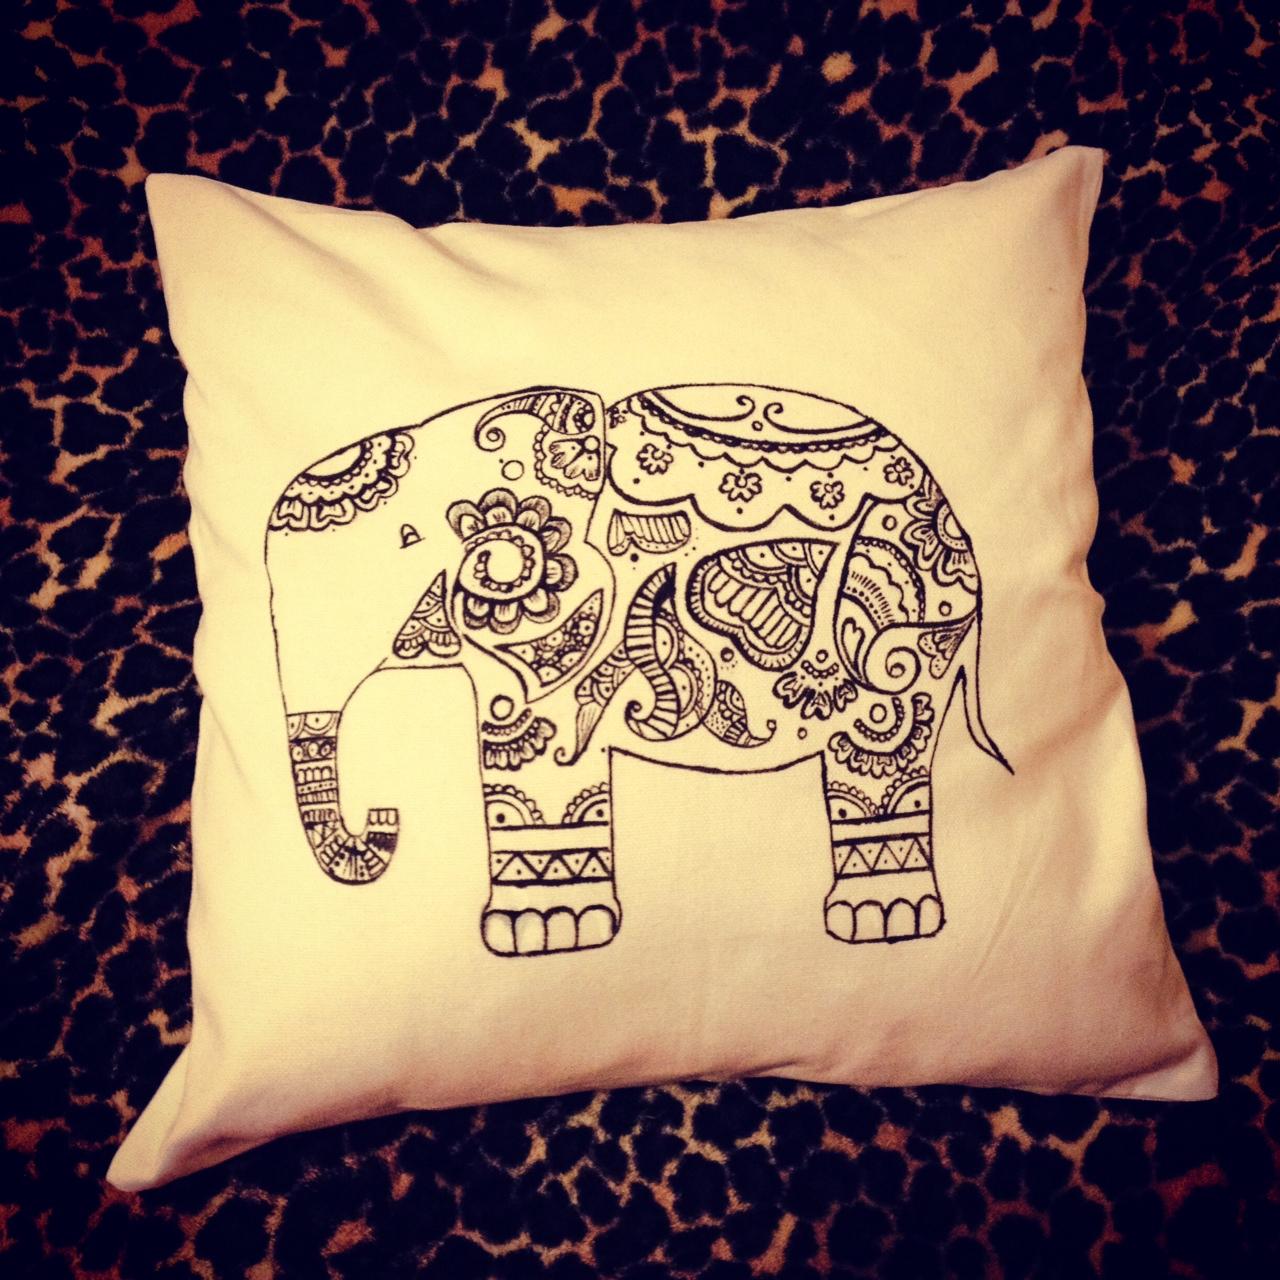 DIY Elephant Cushion | The Name Is Tania